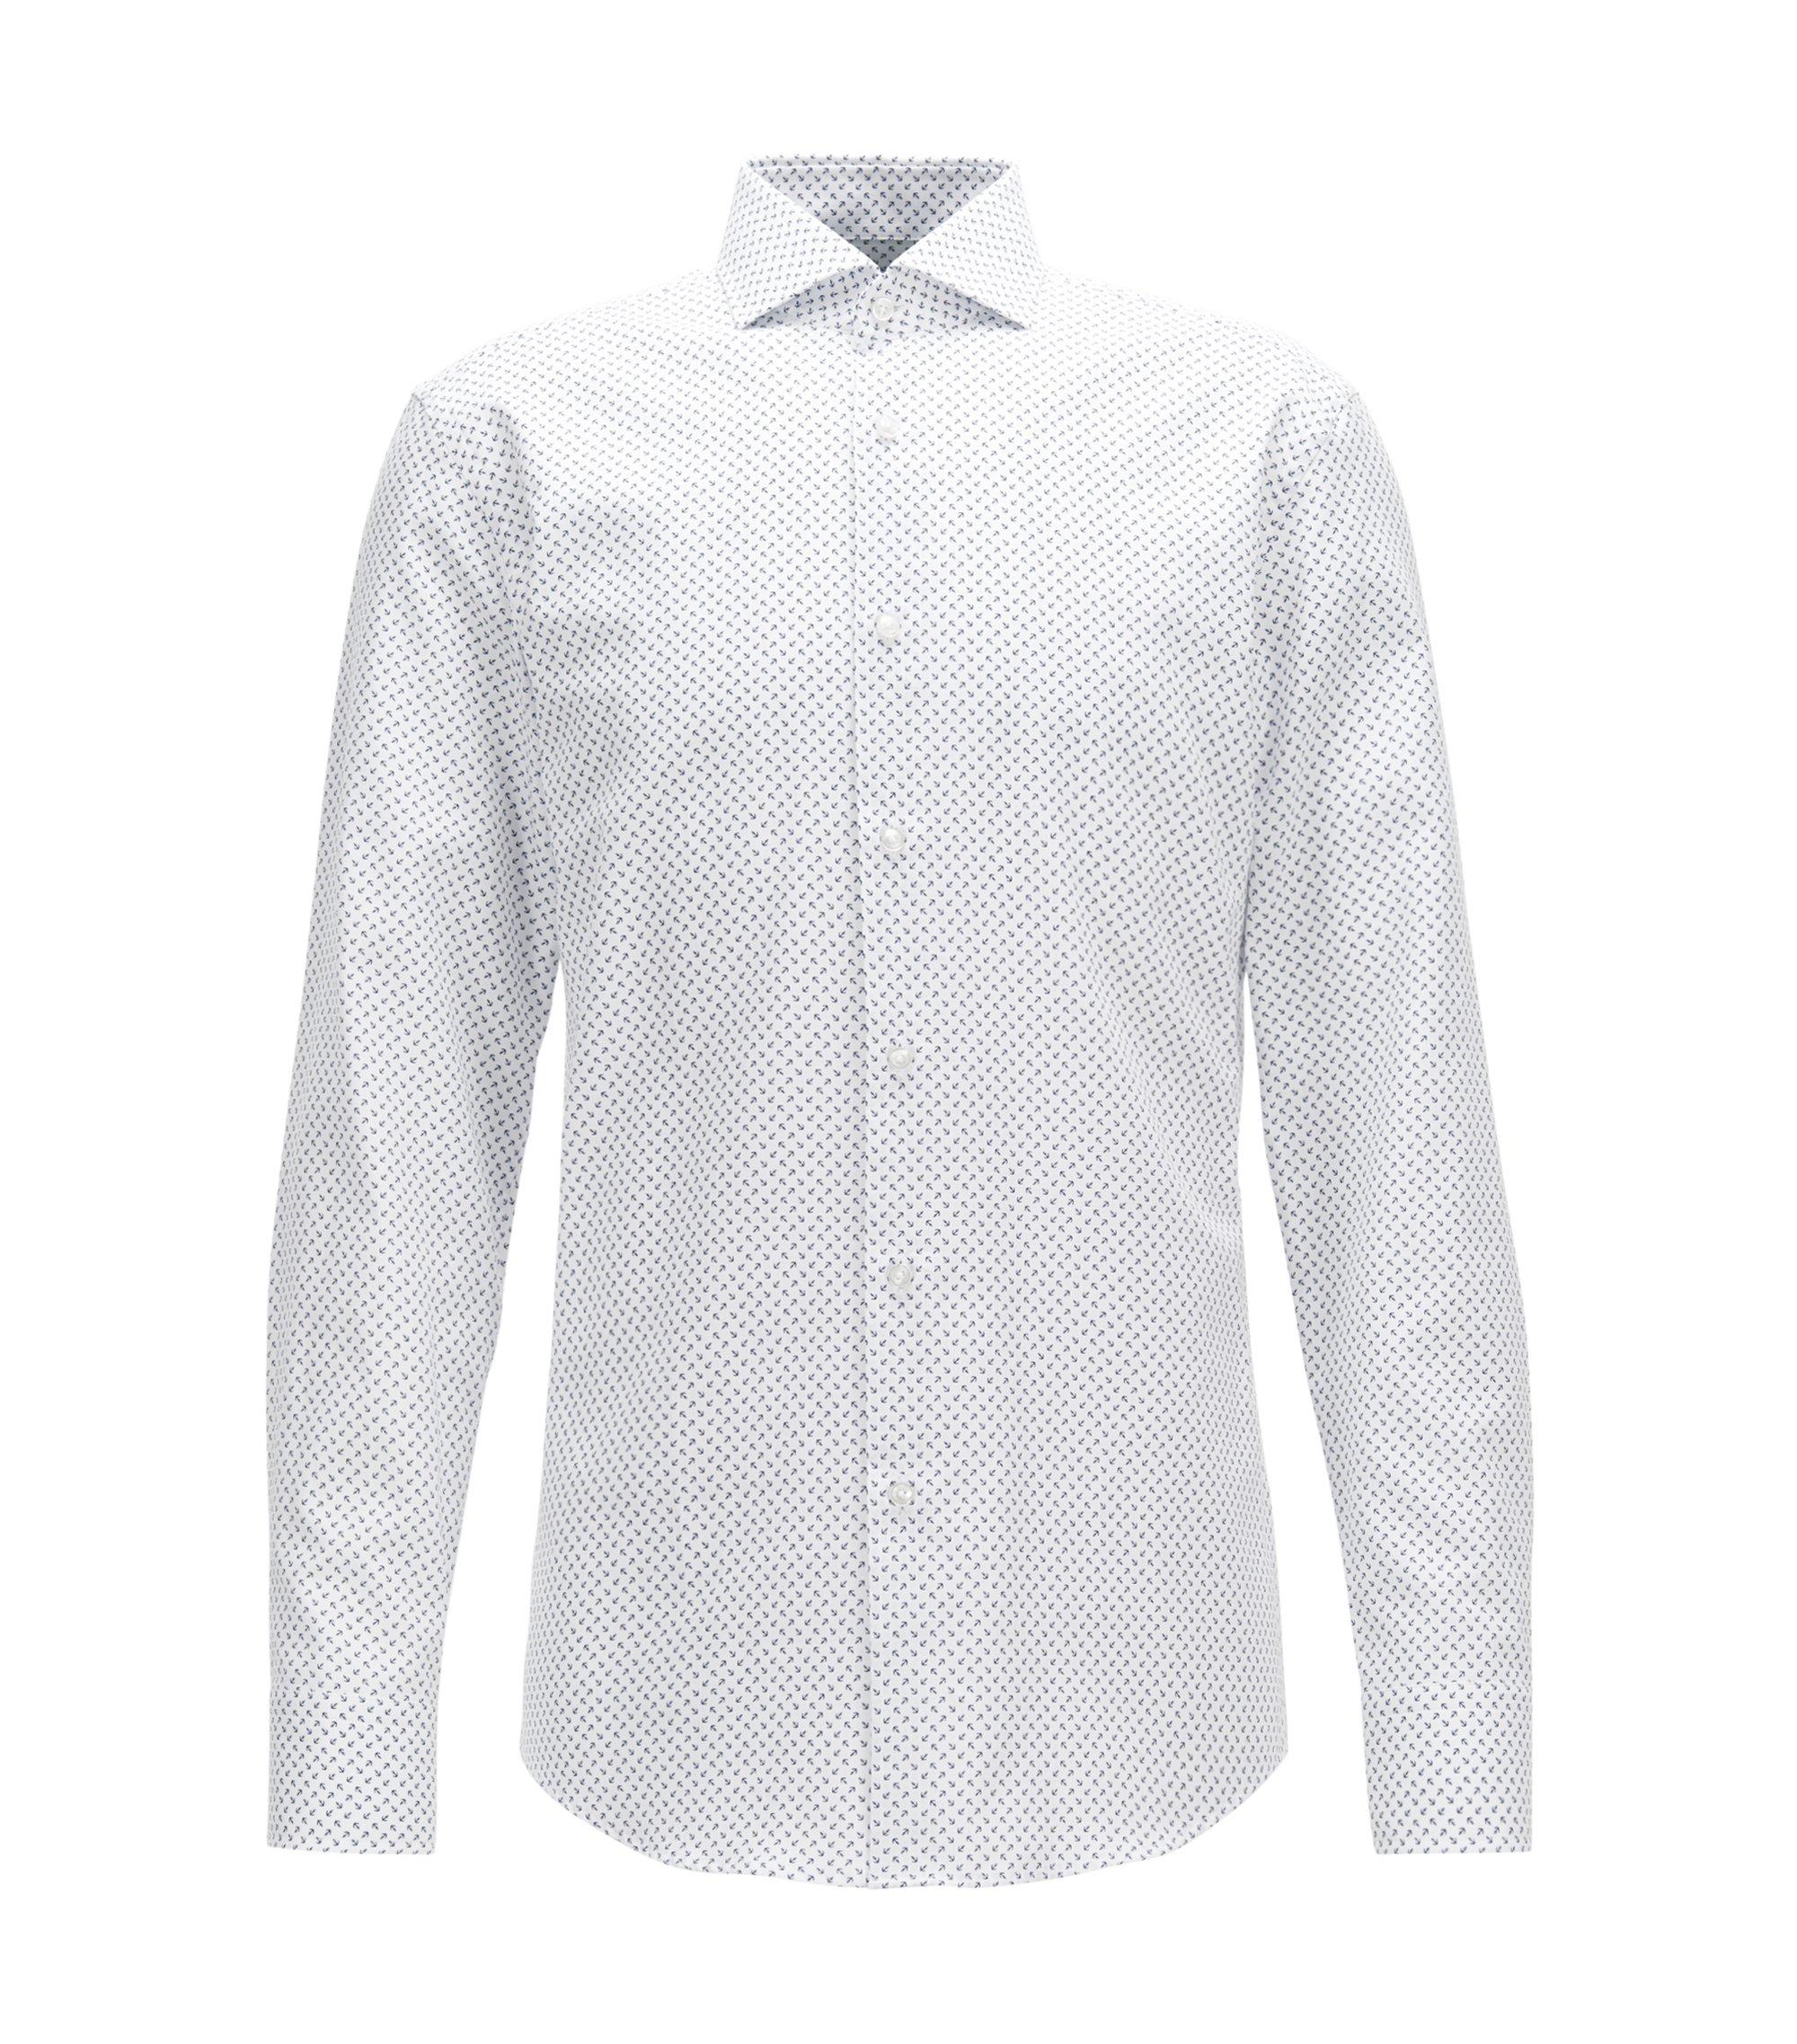 Printed Cotton Dress Shirt, Slim Fit | Jason, White